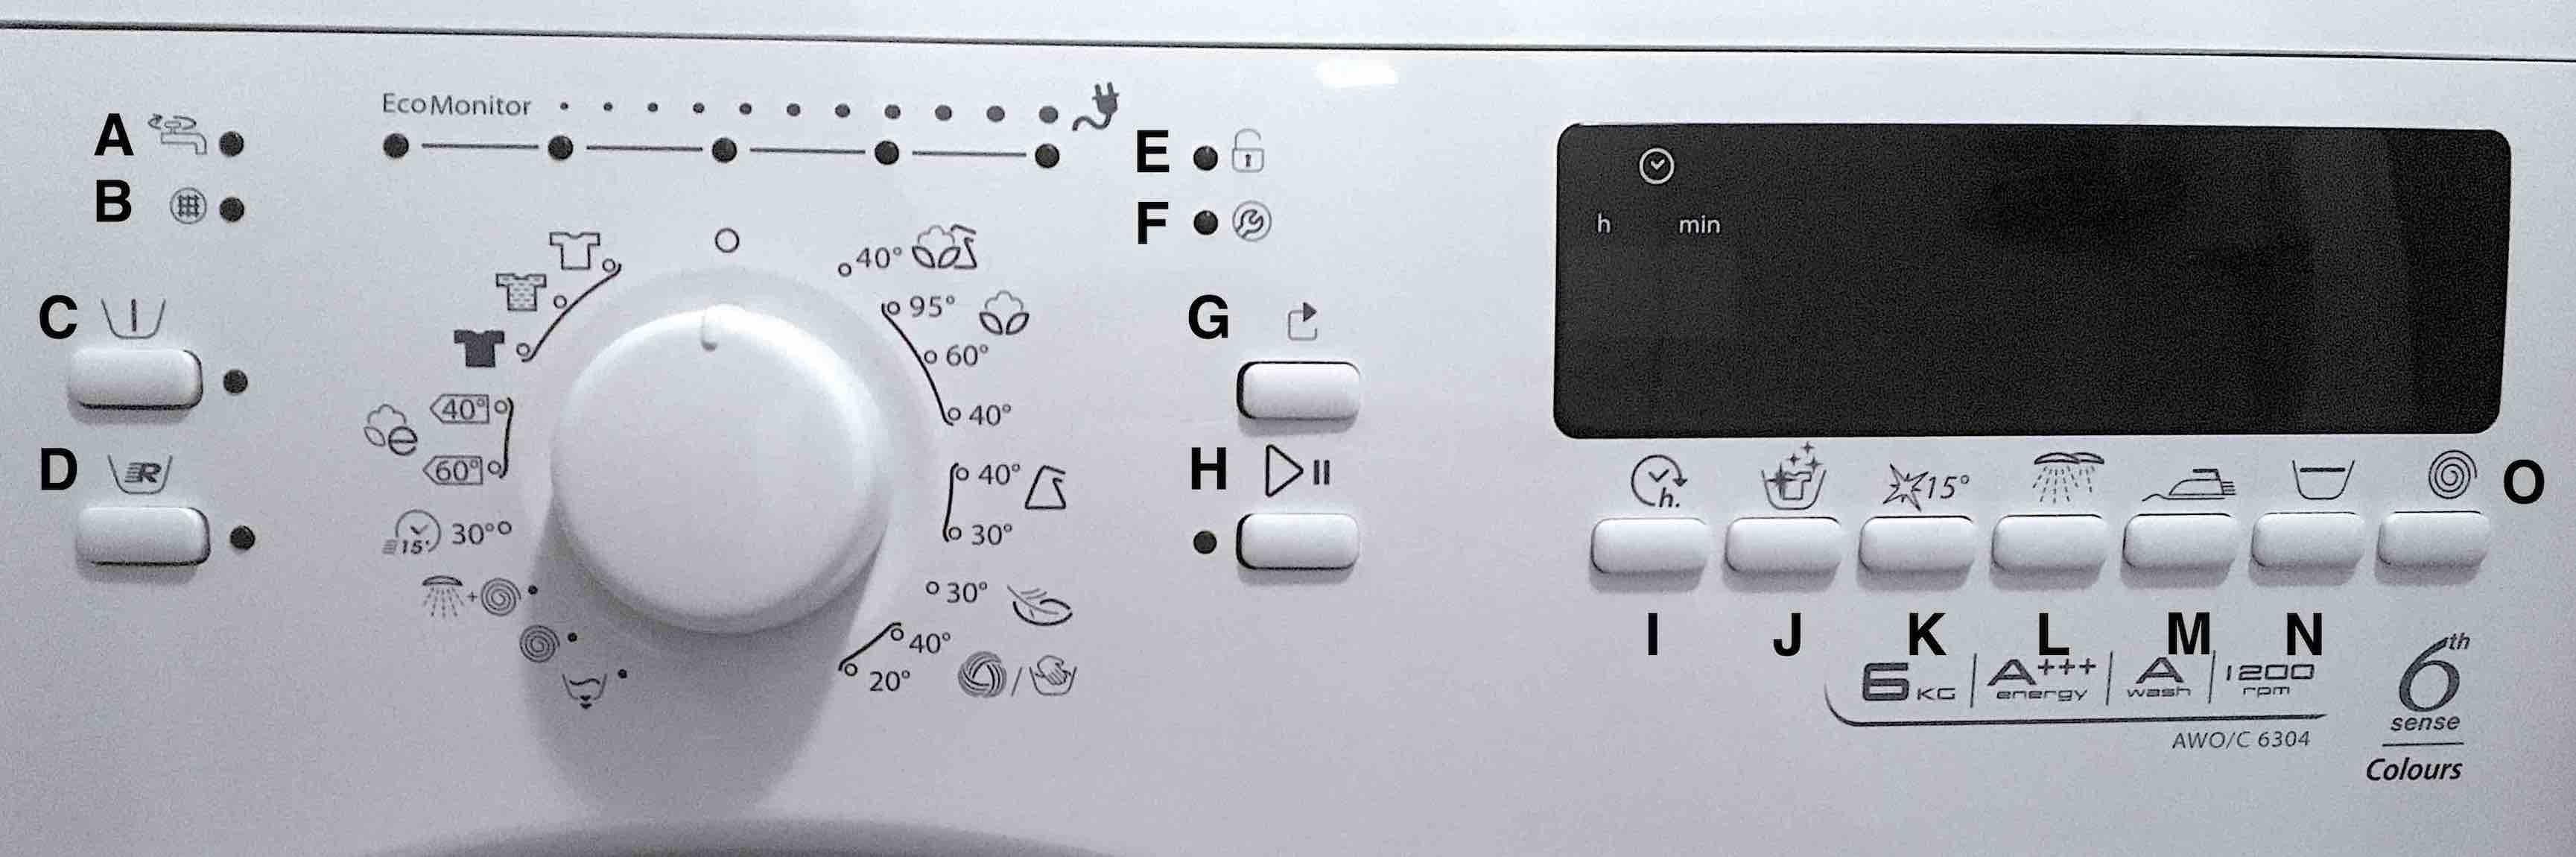 Fotografie funkcí a kontrolek pračky Whirlpool AWO/C 6304